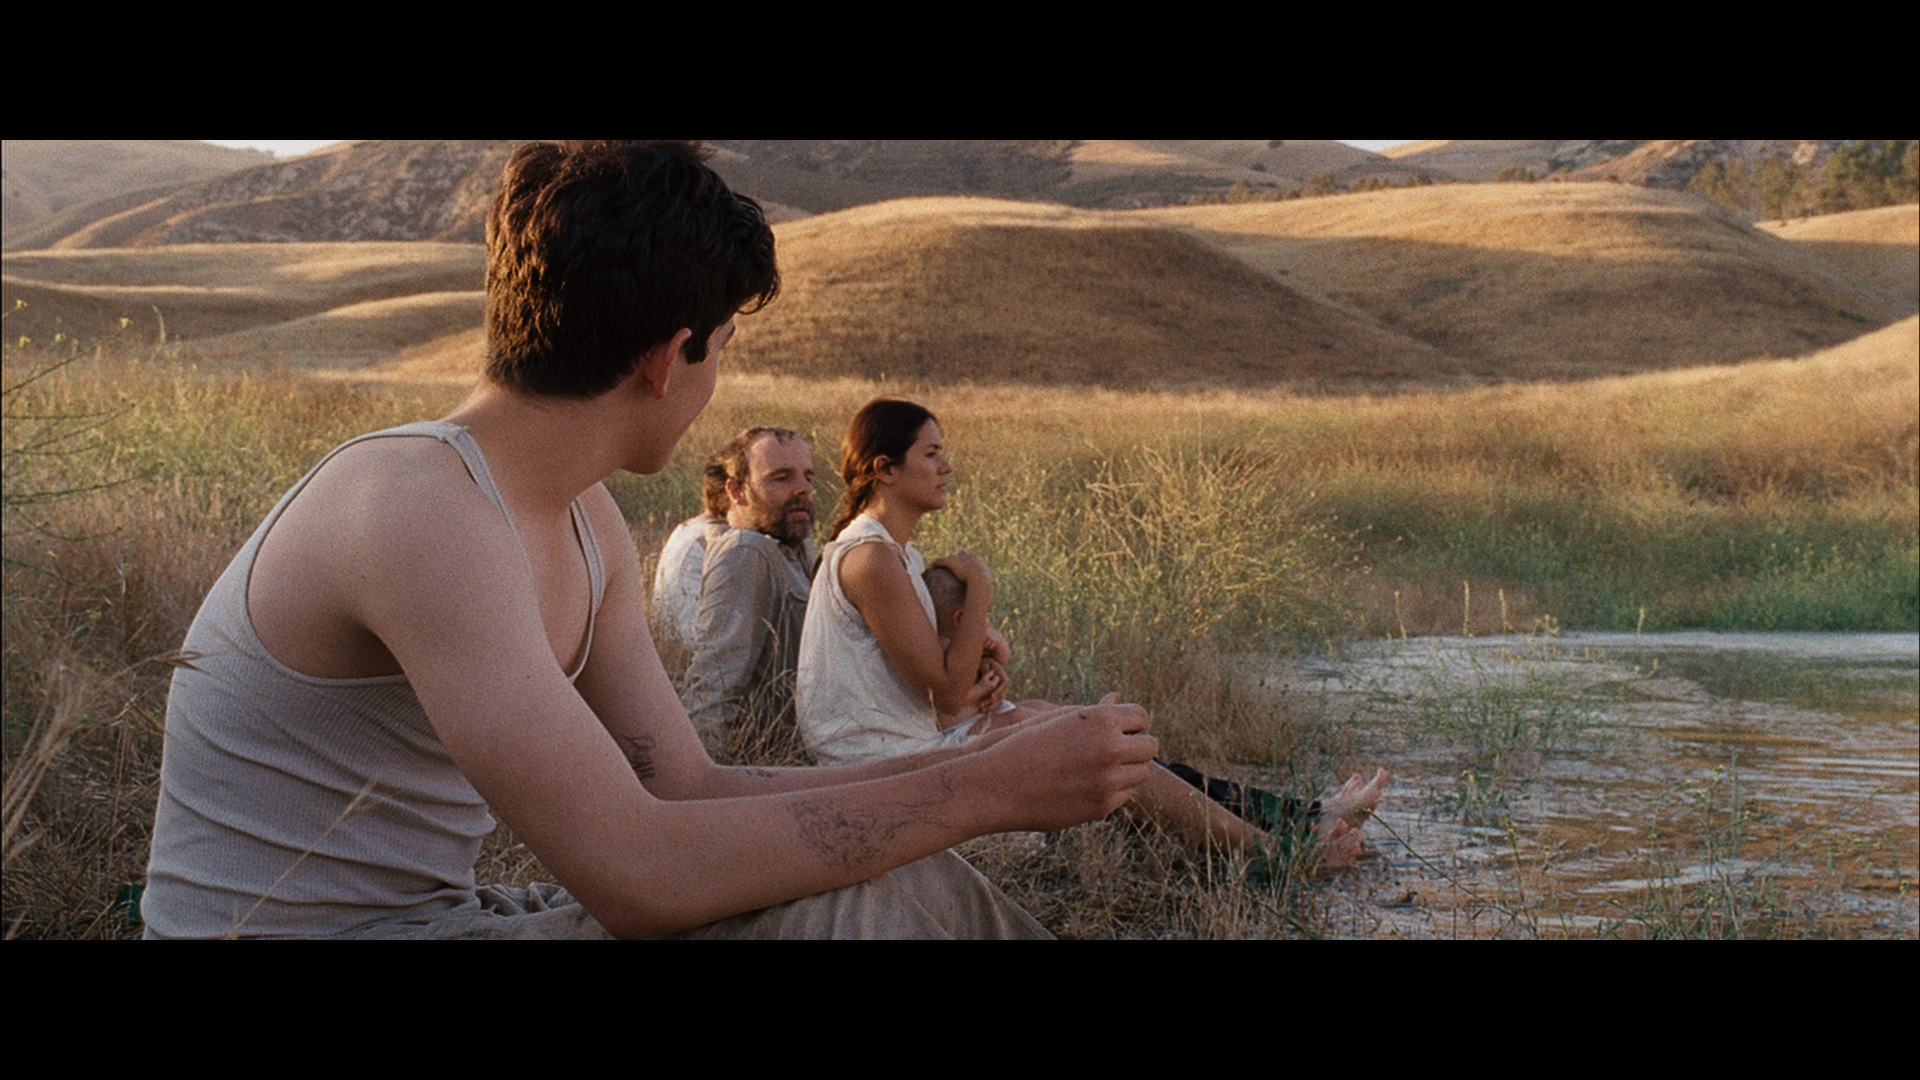 Medeas - 2013 - films released 2000 - 2017 - films & docu